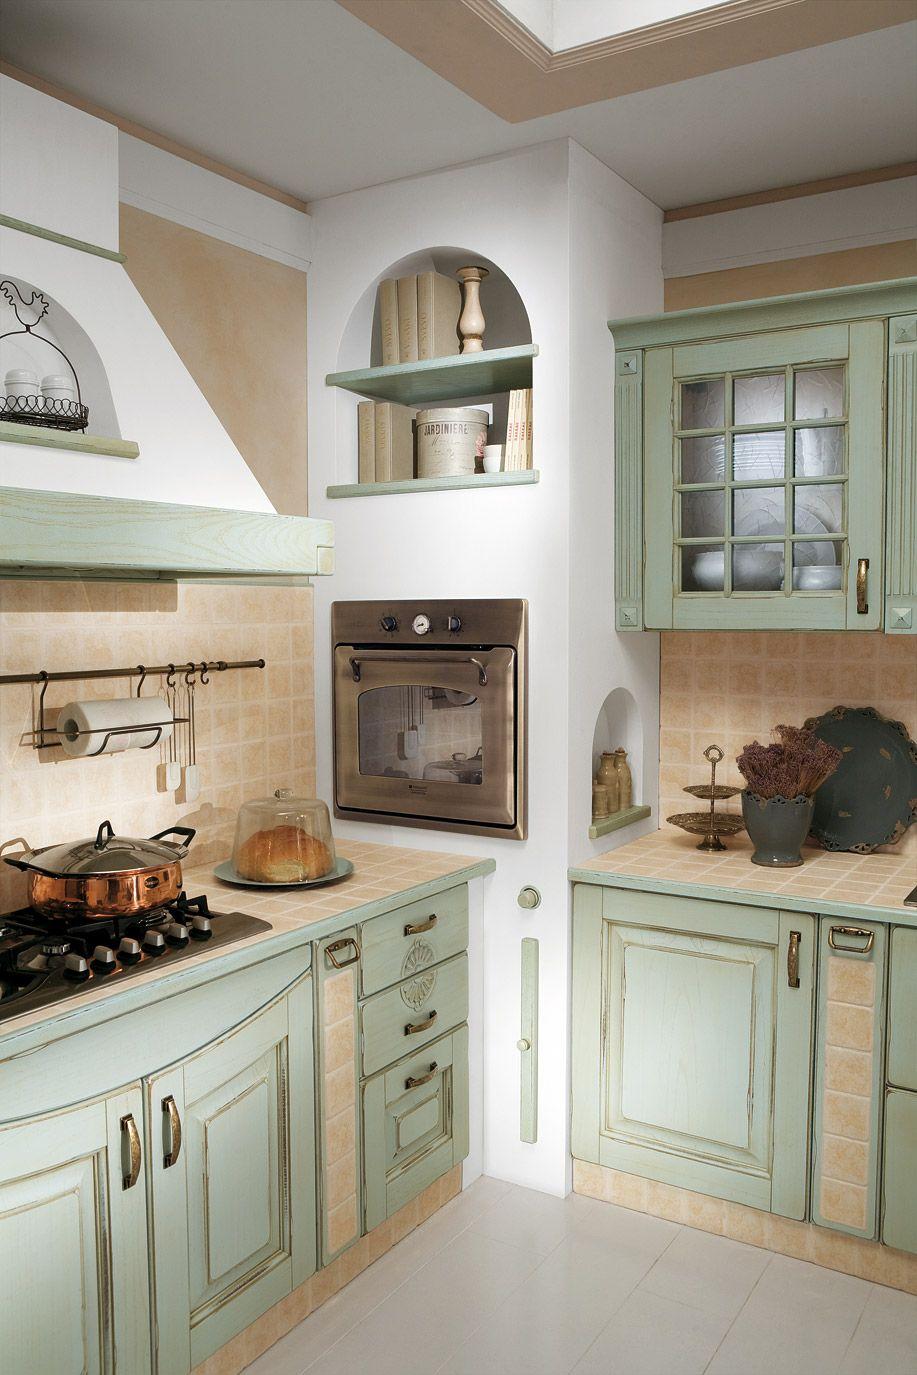 Cucina E Soggiorno Insieme luminosità, design, stile insieme a funzionalità e praticità